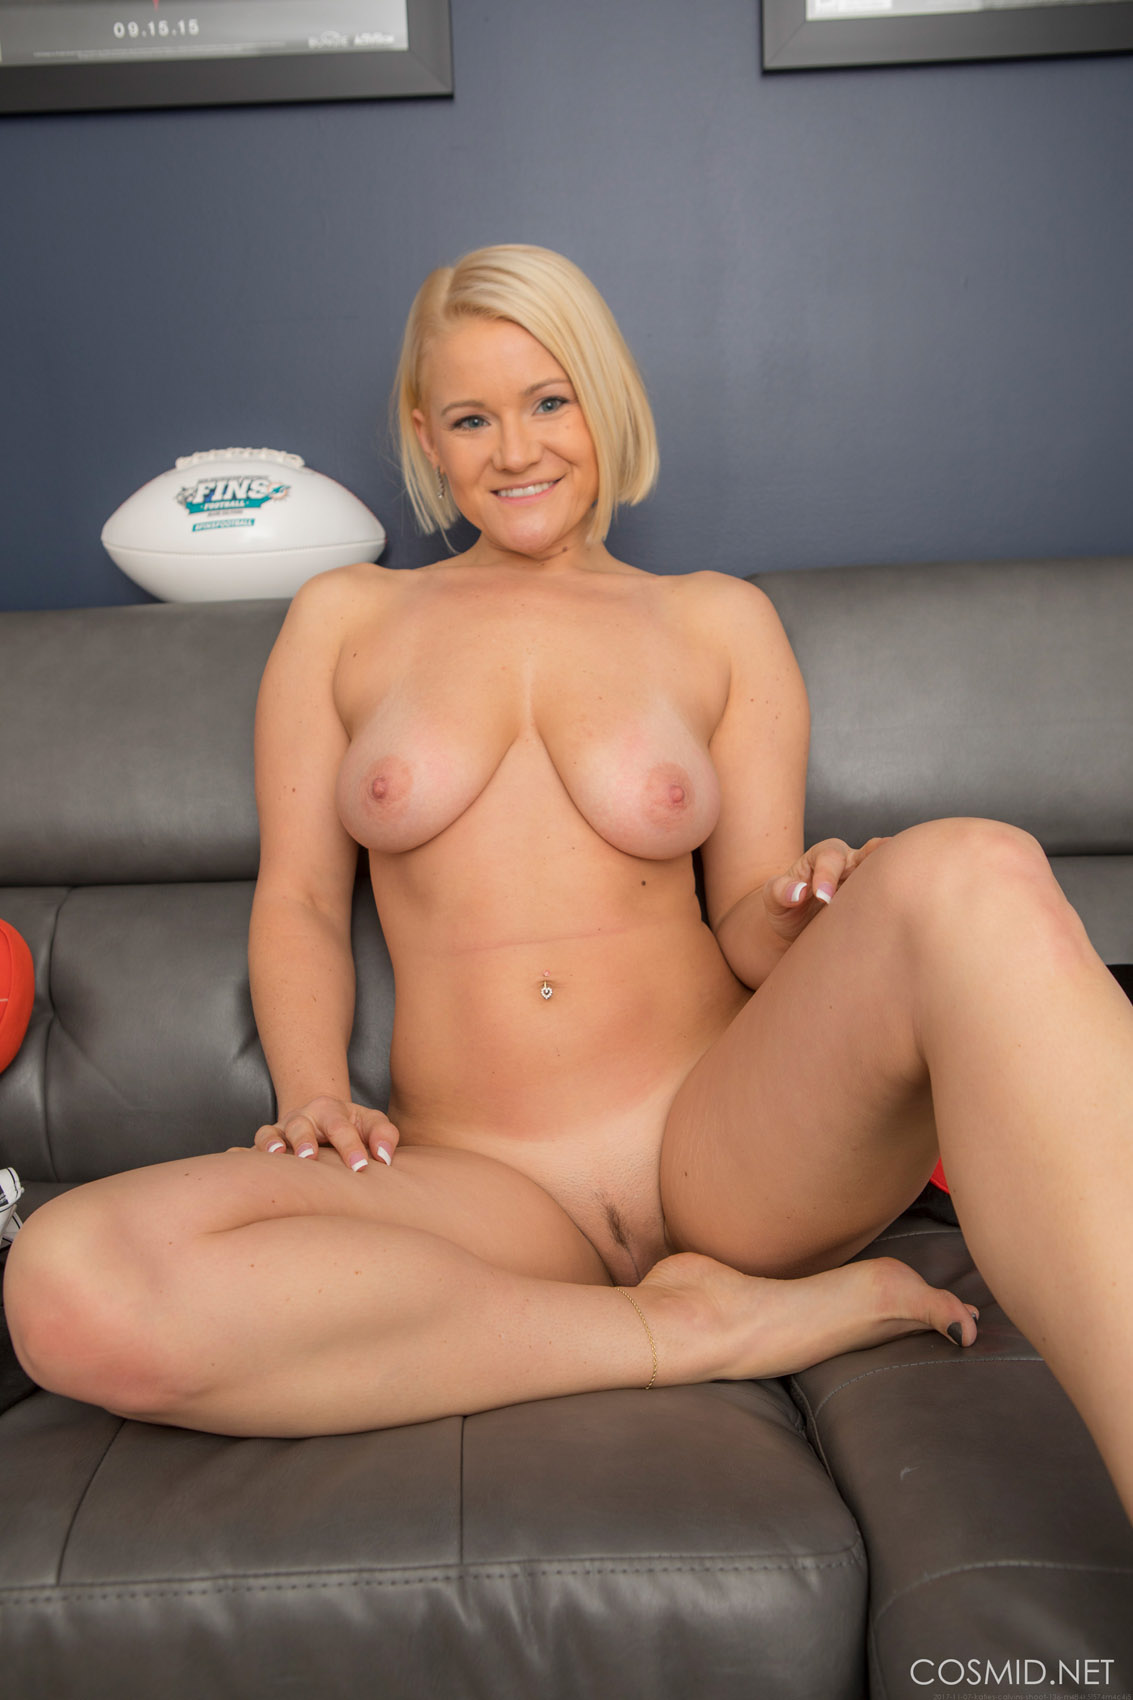 Amateur webcam girl ride dildo on webcam